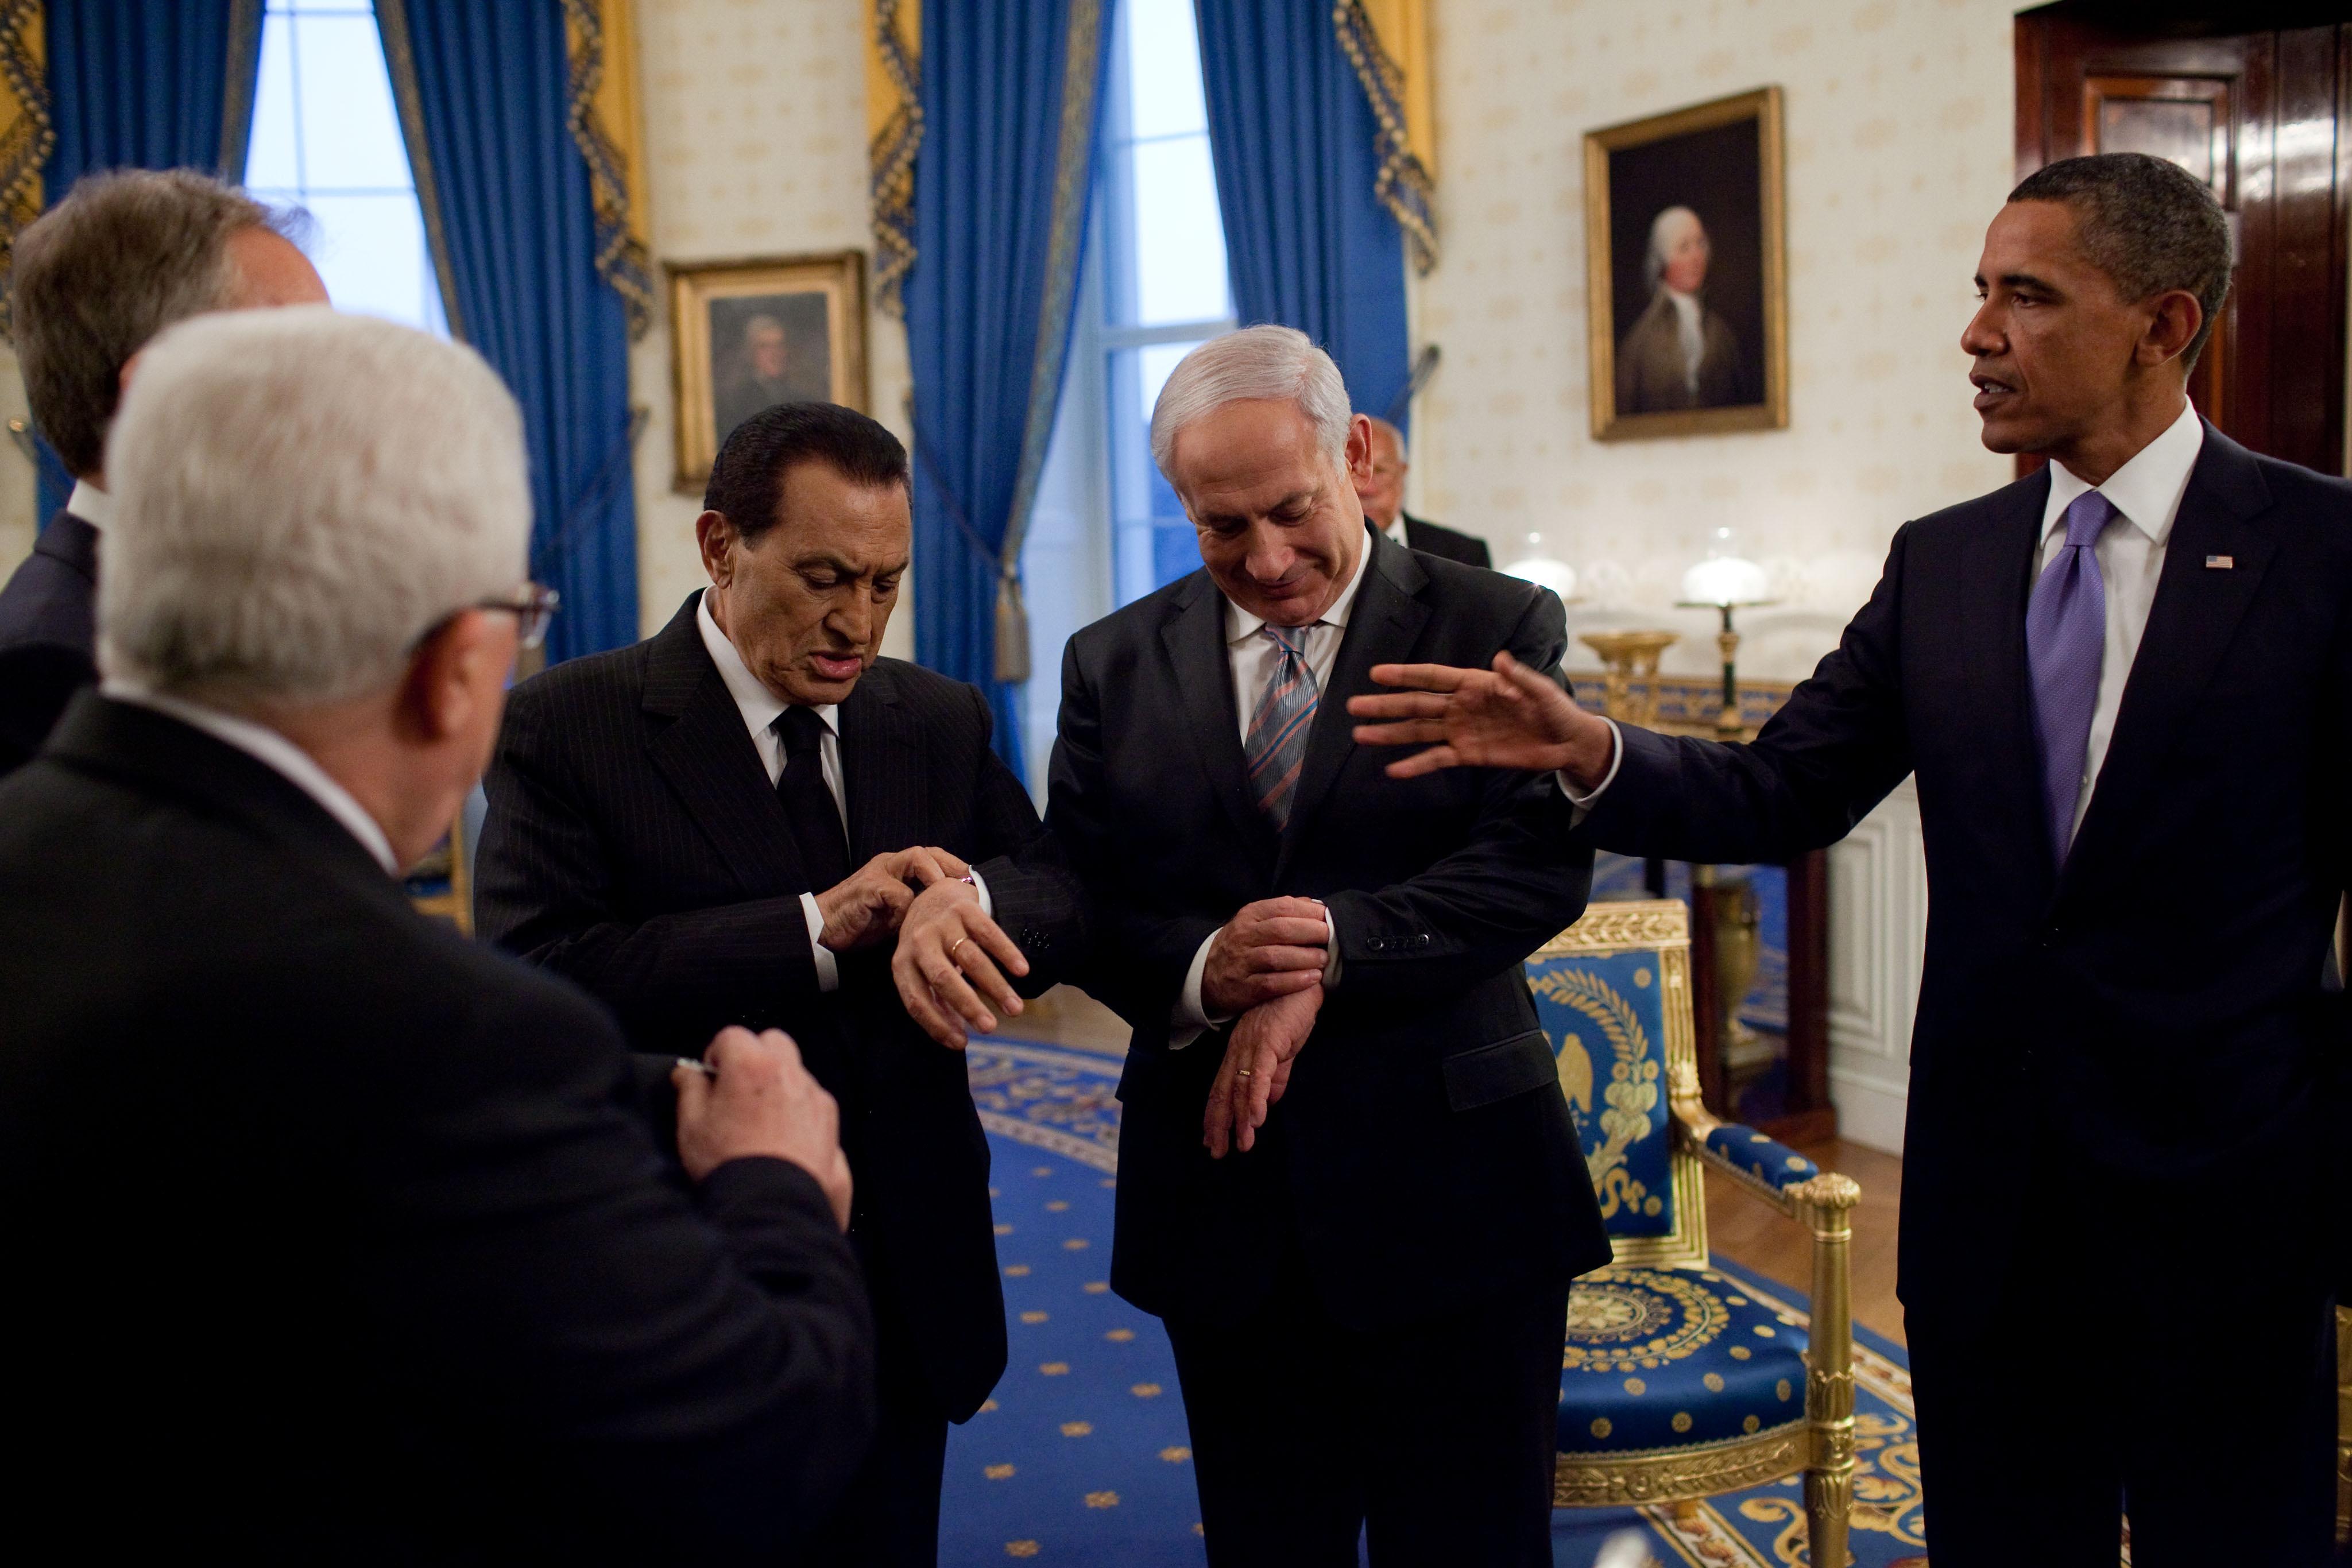 President Hosni Mubarak of Egypt and Prime Minister Benjamin Netanyahu of Israel